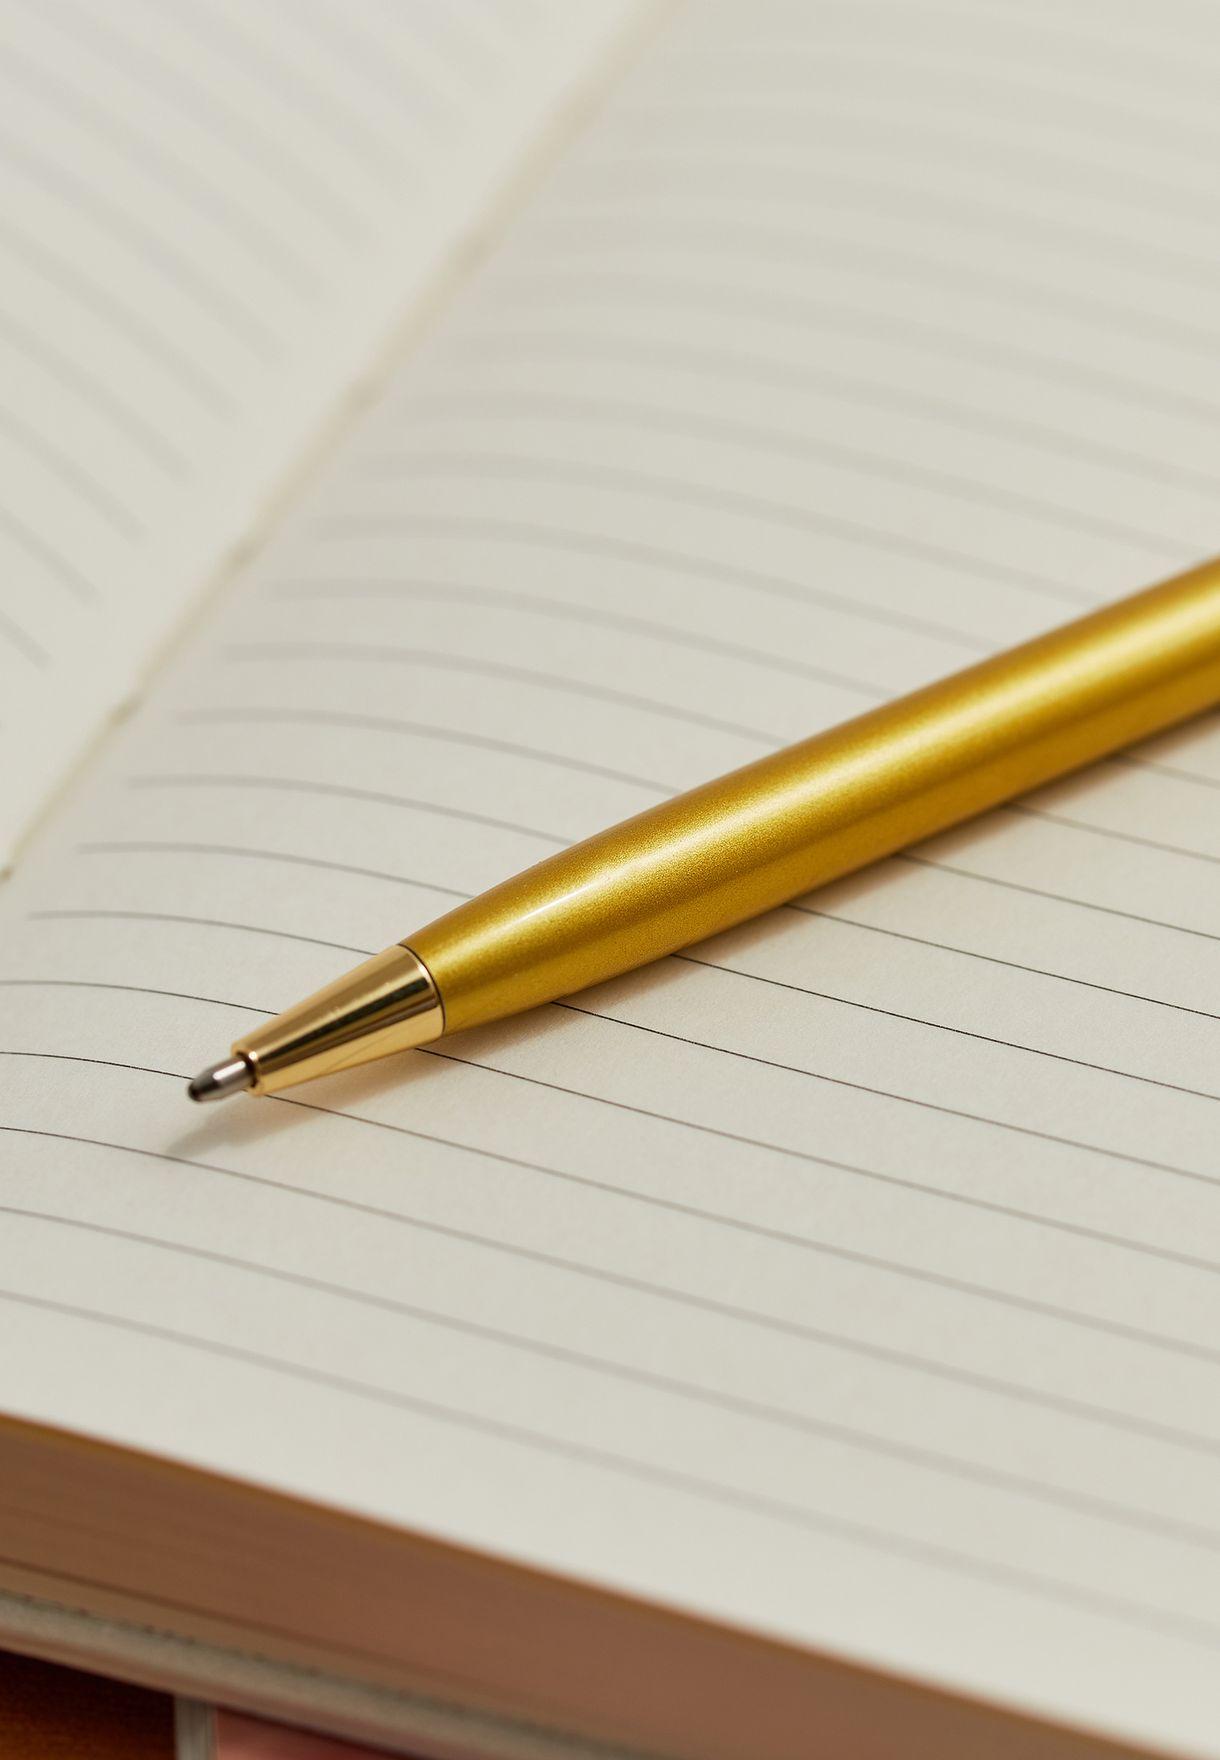 دفتر ملاحظات بطبعة حرف A